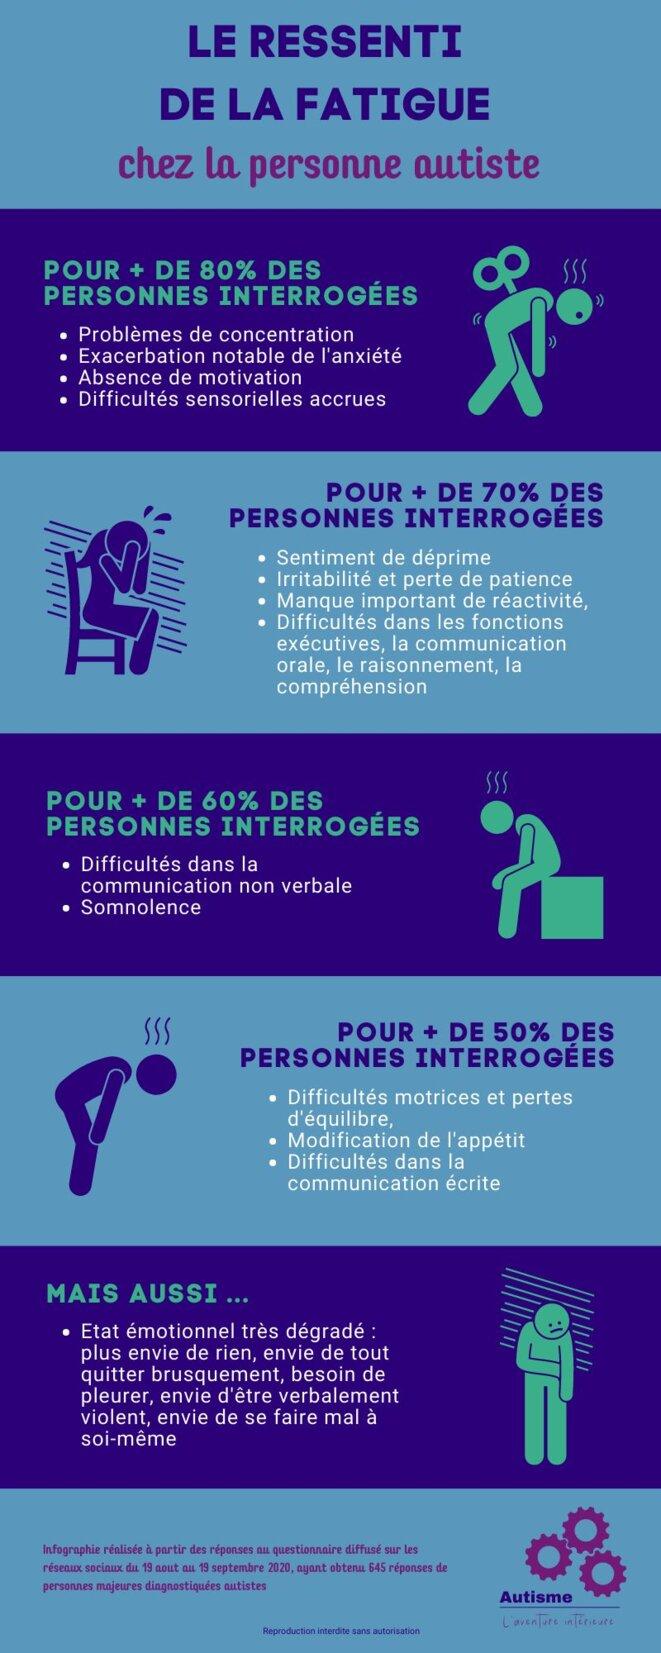 aai-infographie-ressenti-fatigue